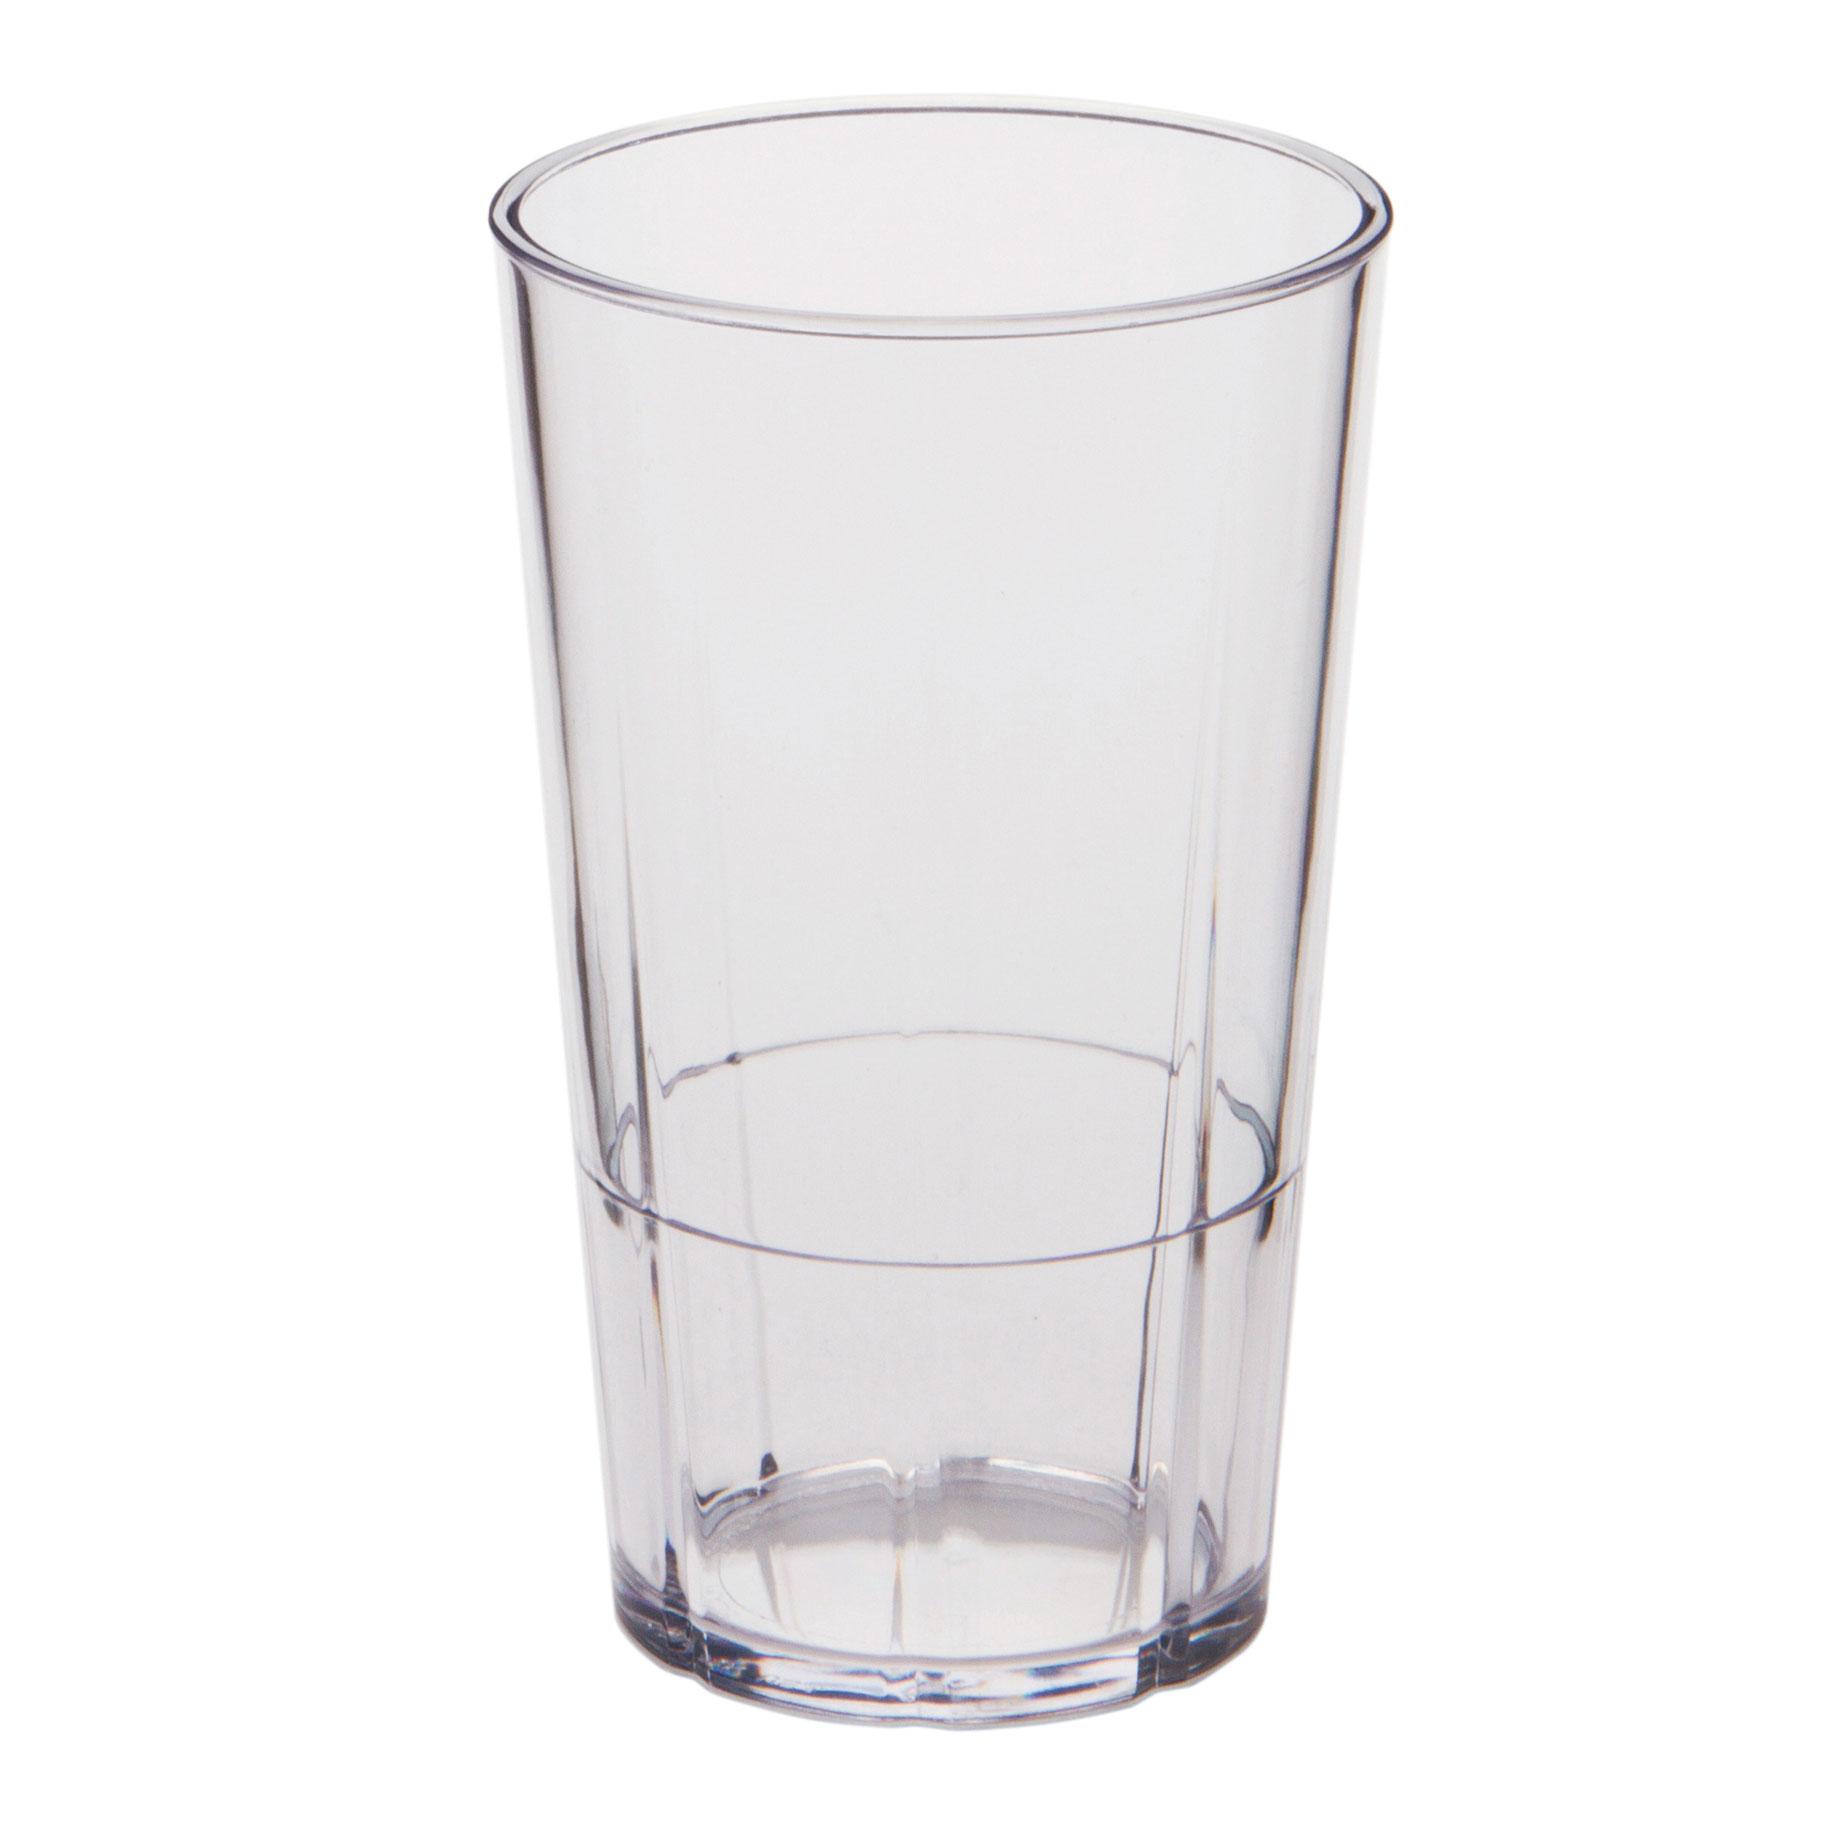 Cambro LDT12152 plastic drinkware